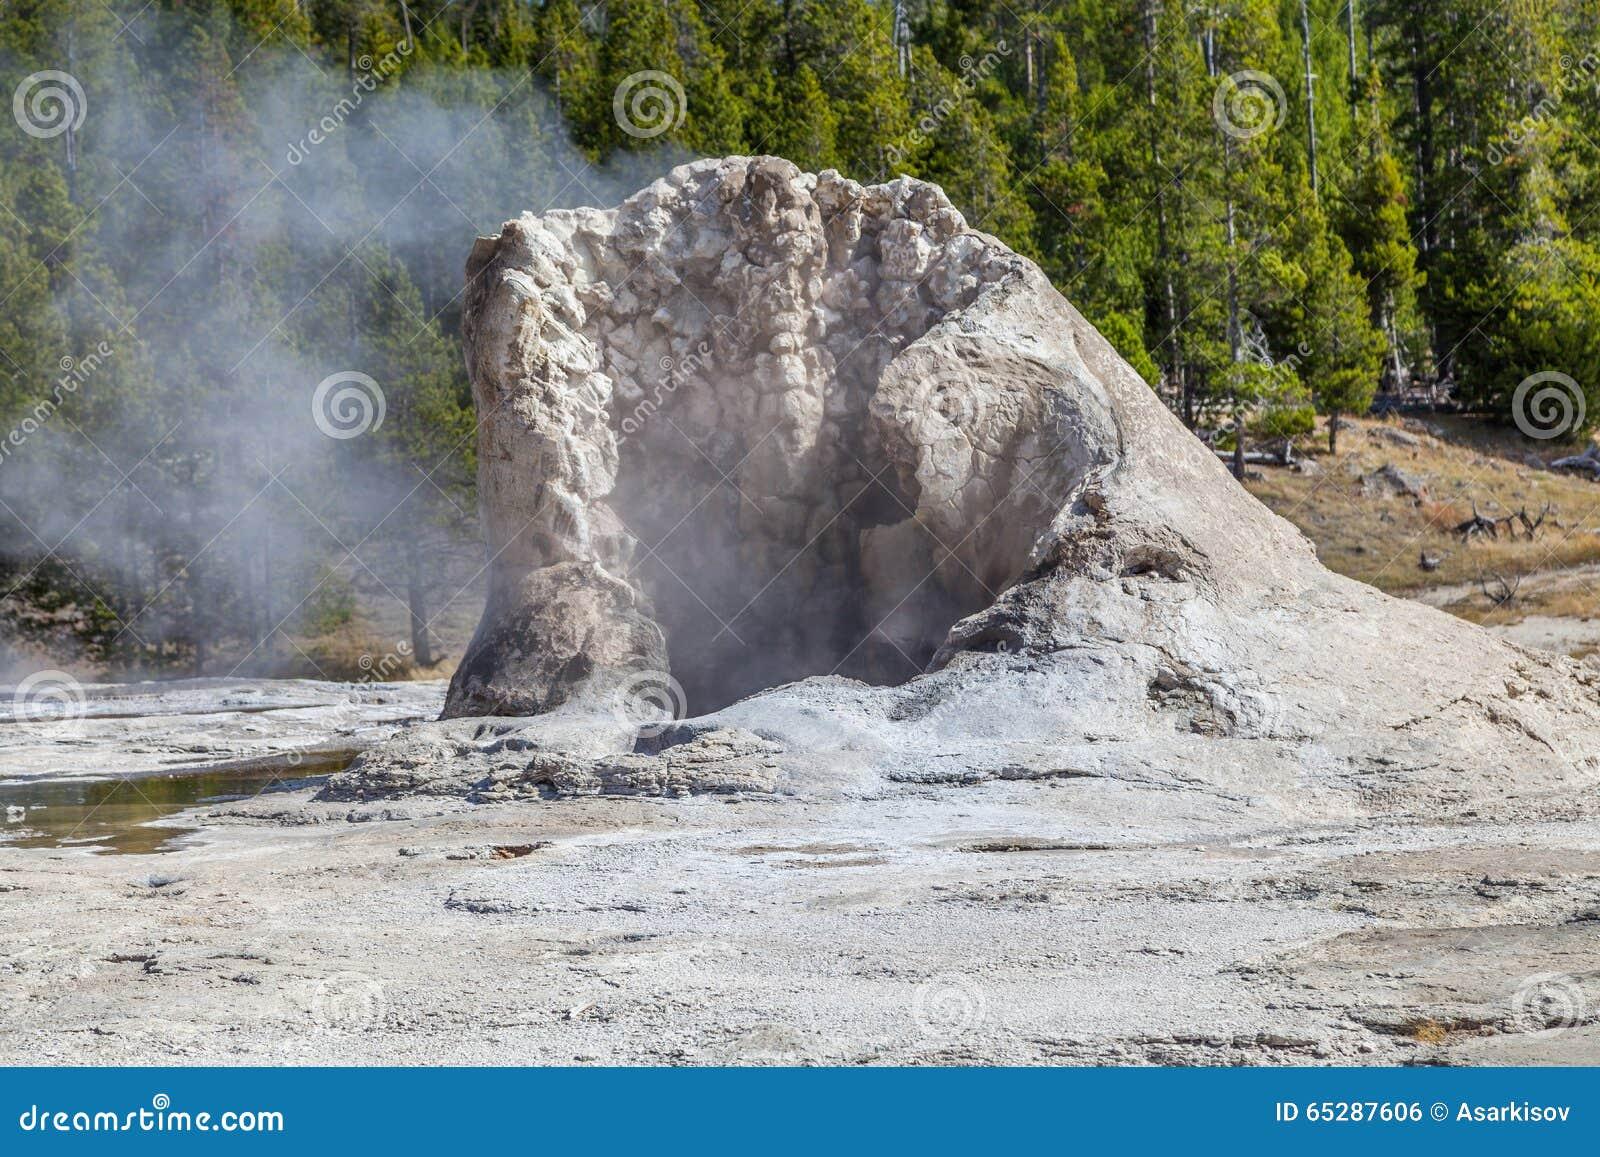 Yellowstone plan - Yellowstone National Park Forum